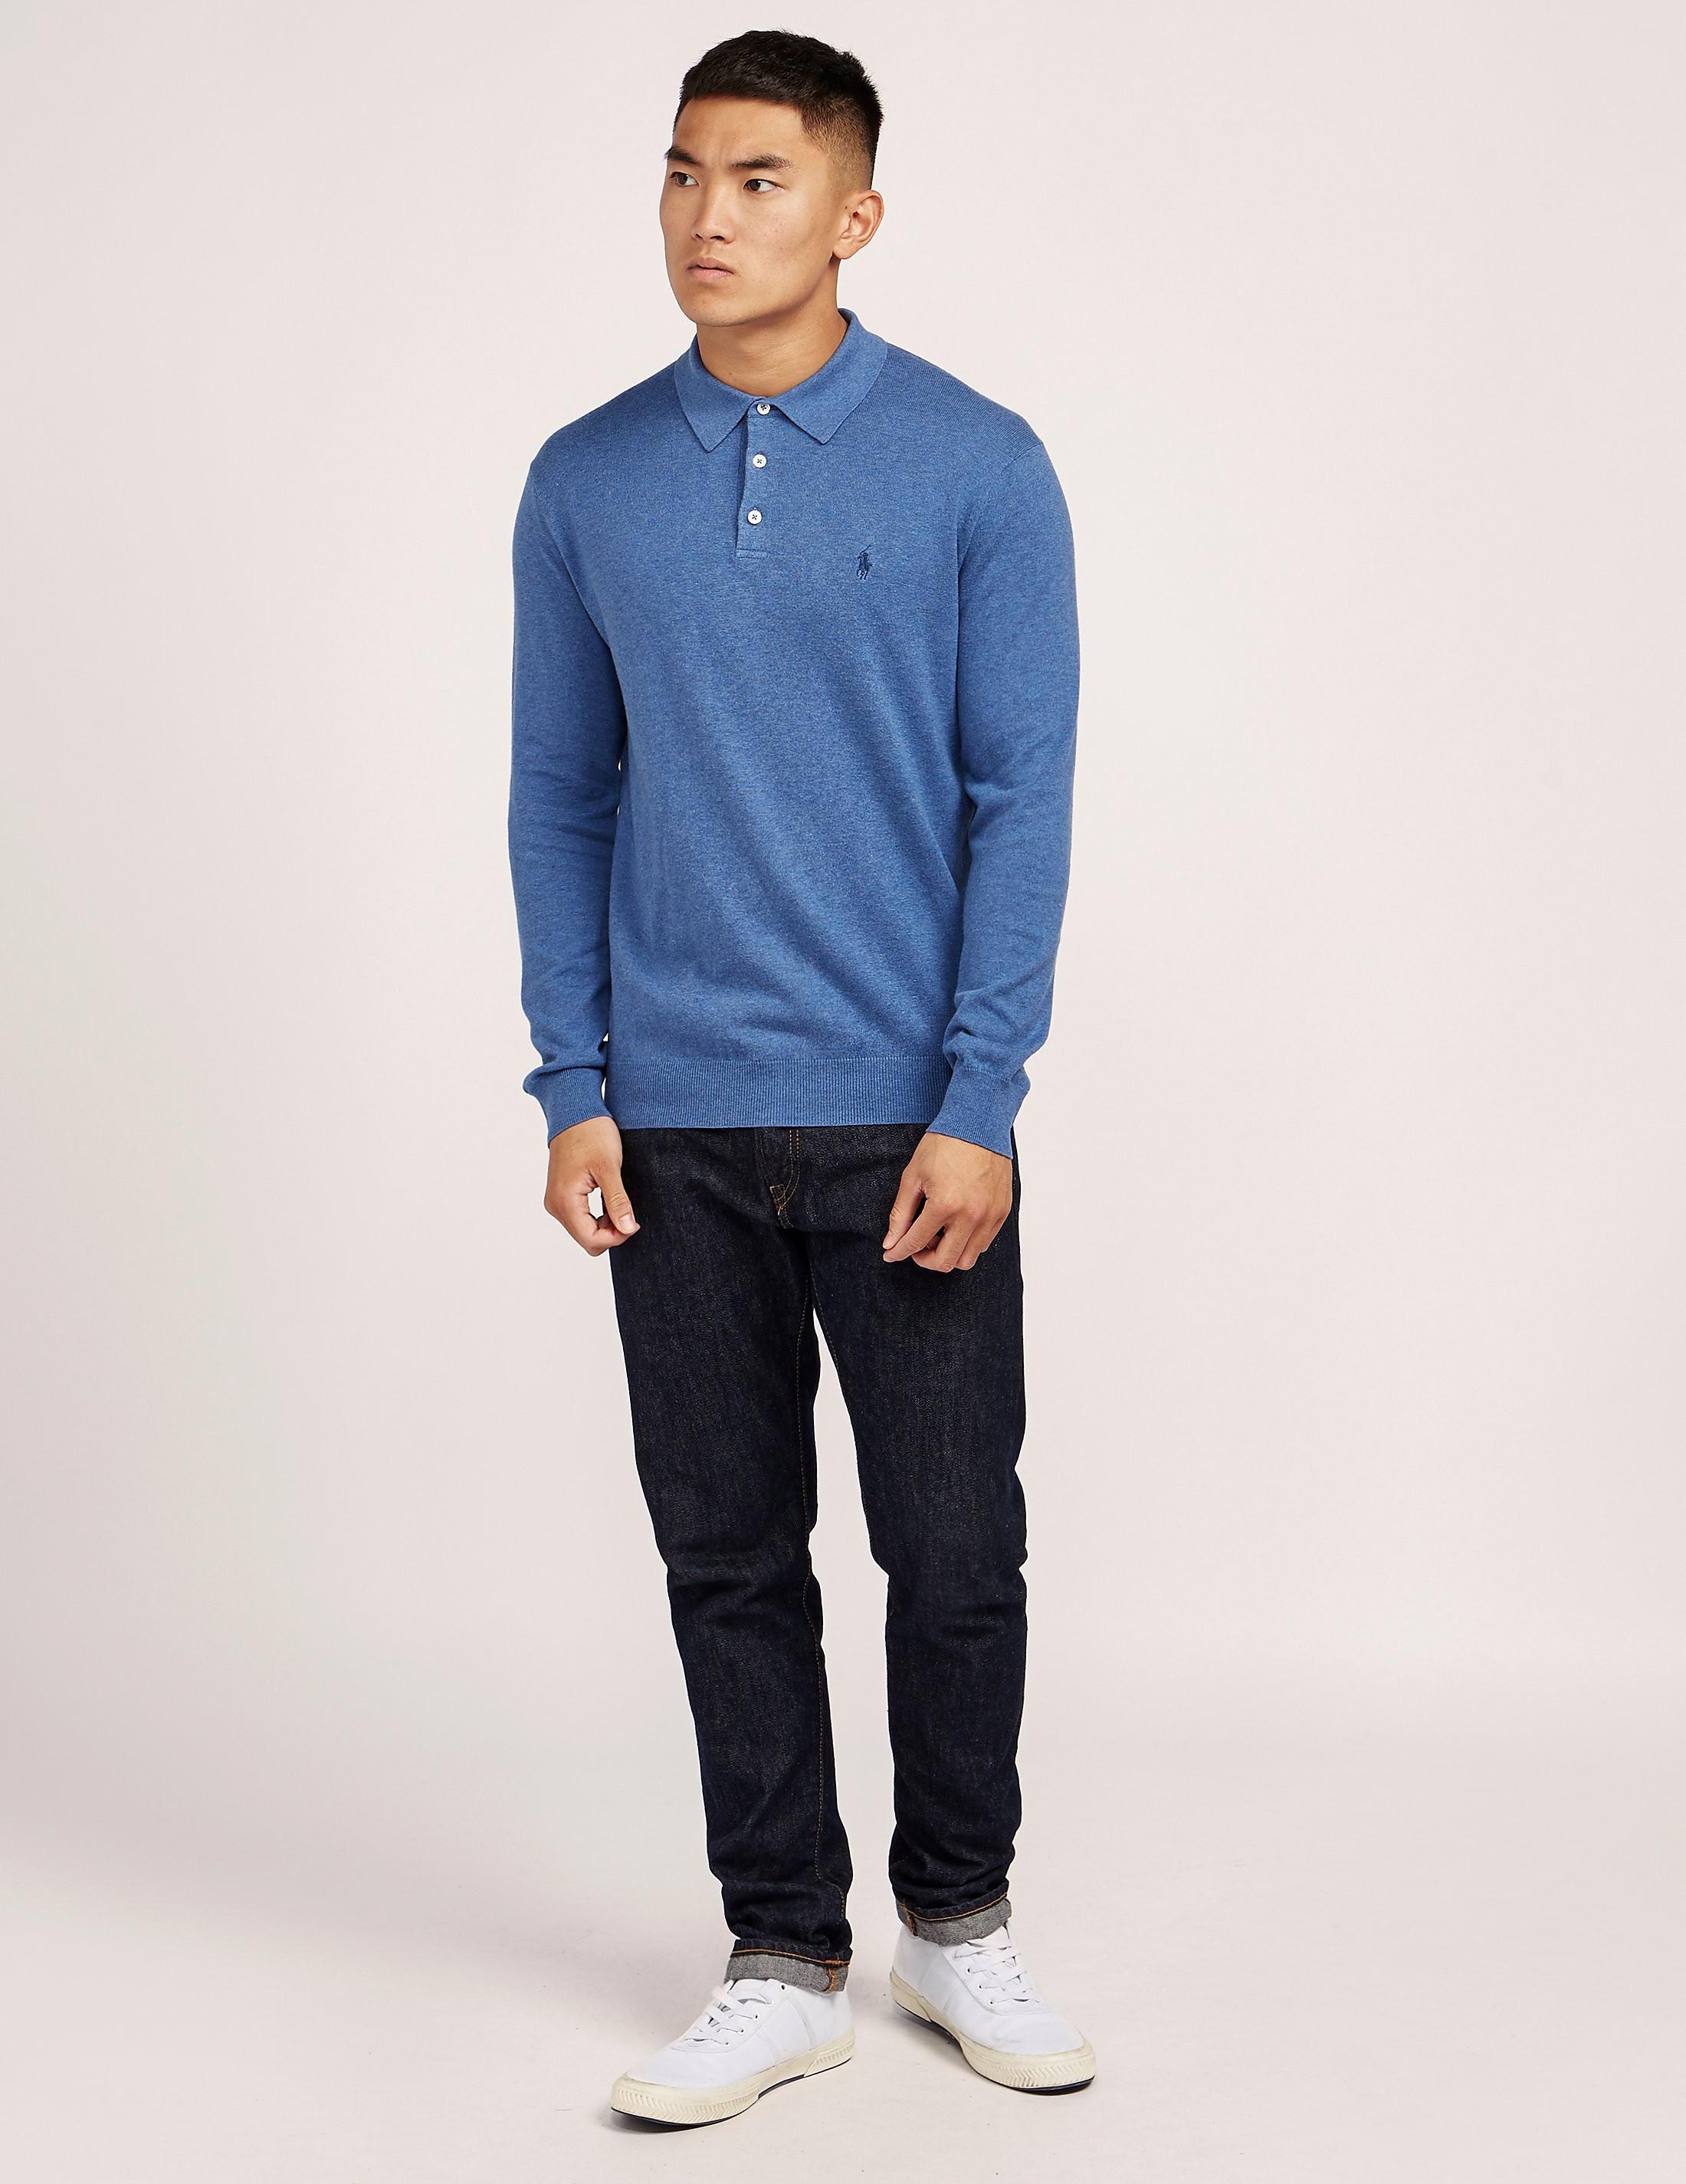 Polo Ralph Lauren Long Sleeve Polo Shirt